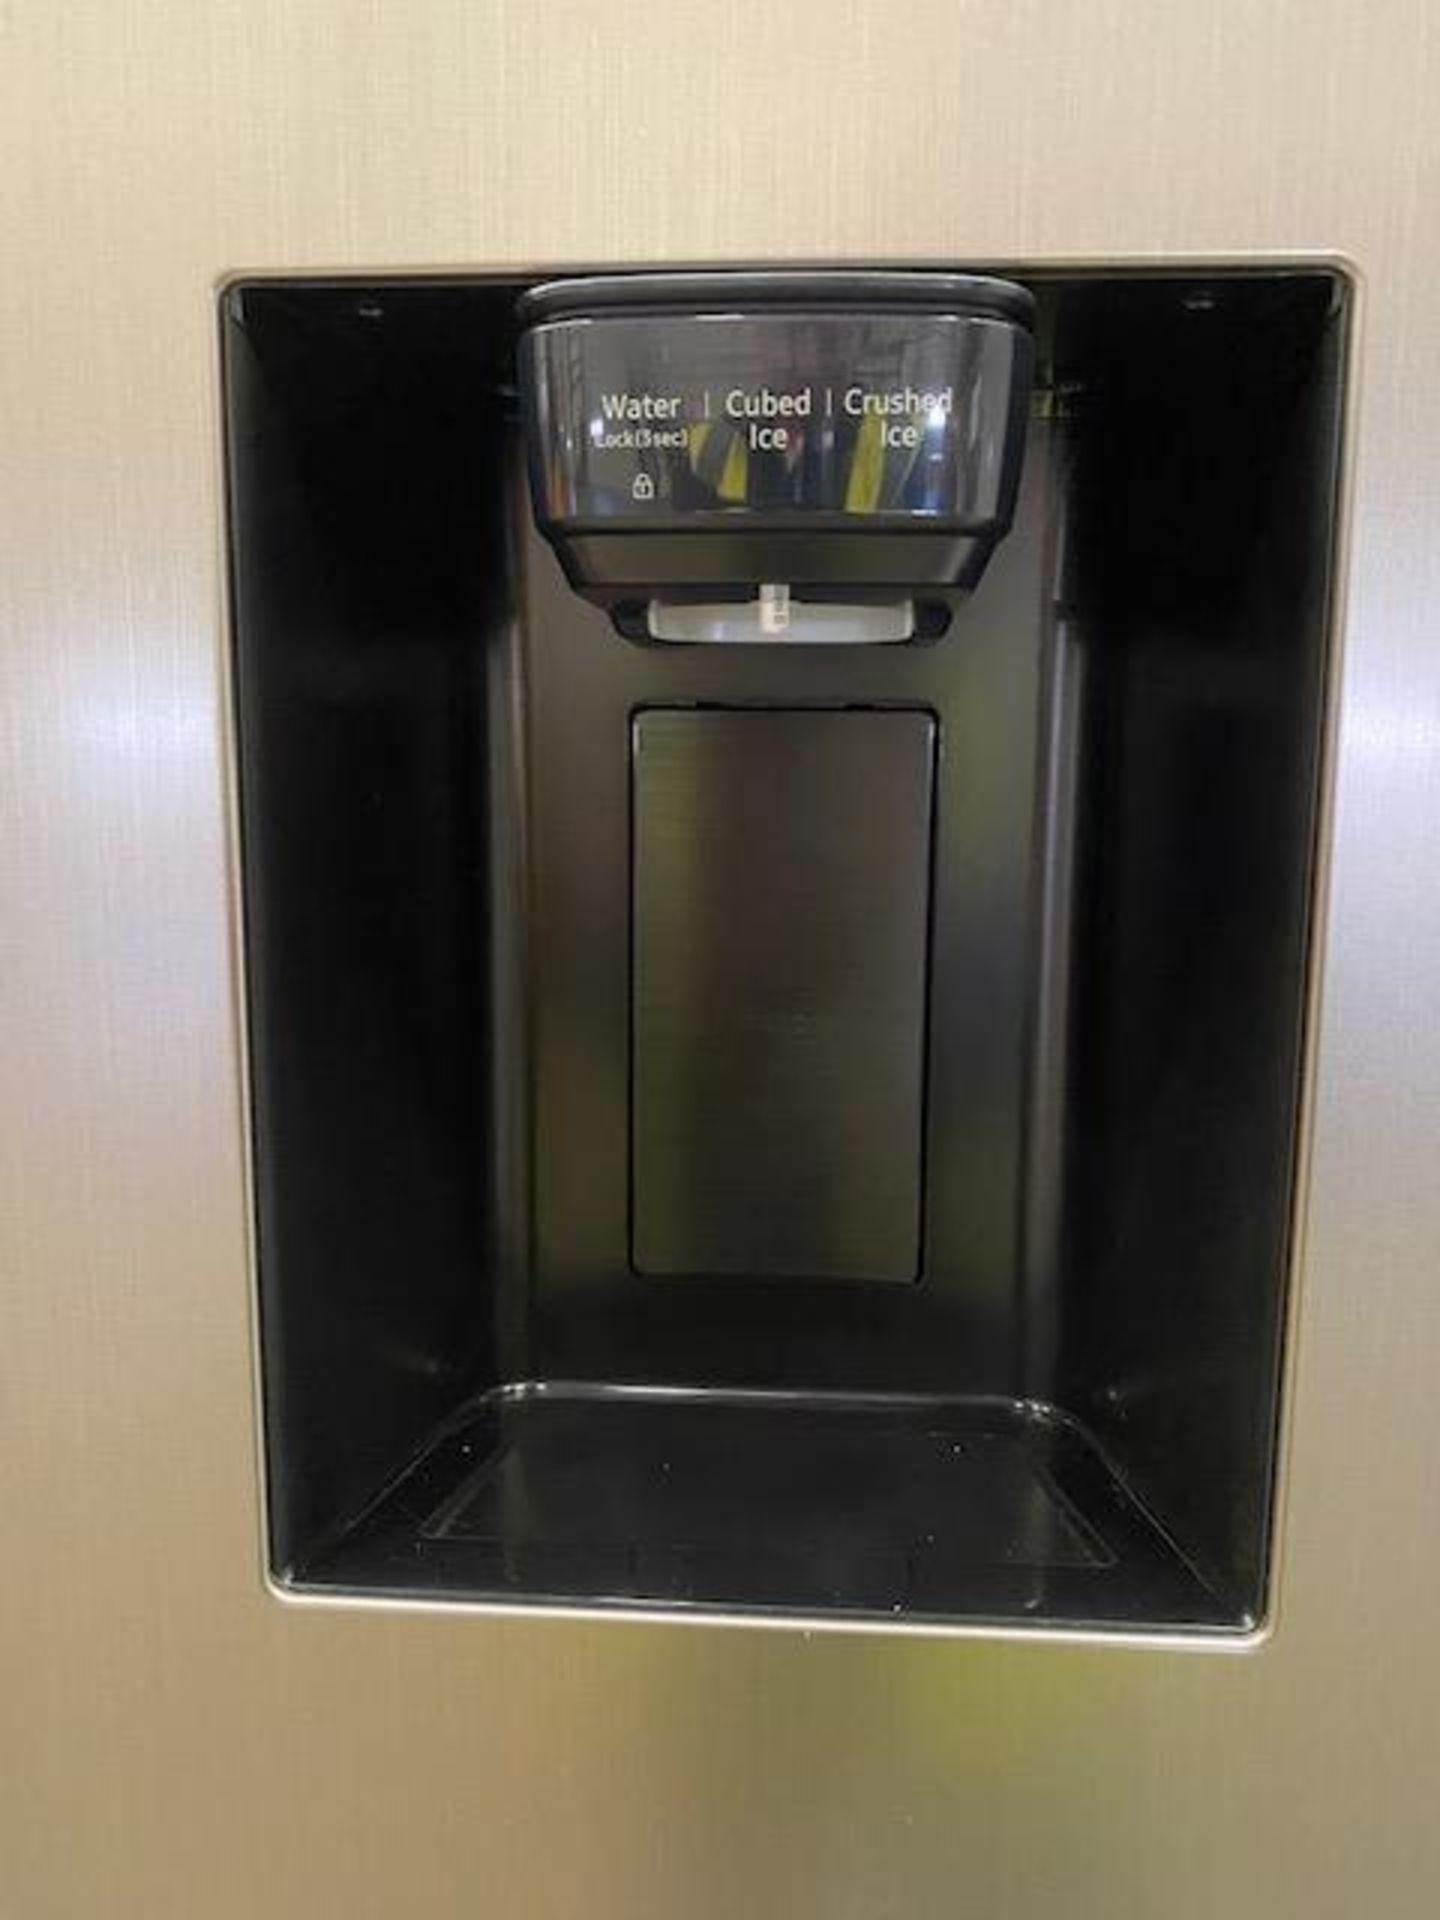 Pallet of 1 Samsung Water & Ice Fridge freezer. Latest selling price £1,329.99* - Image 6 of 9